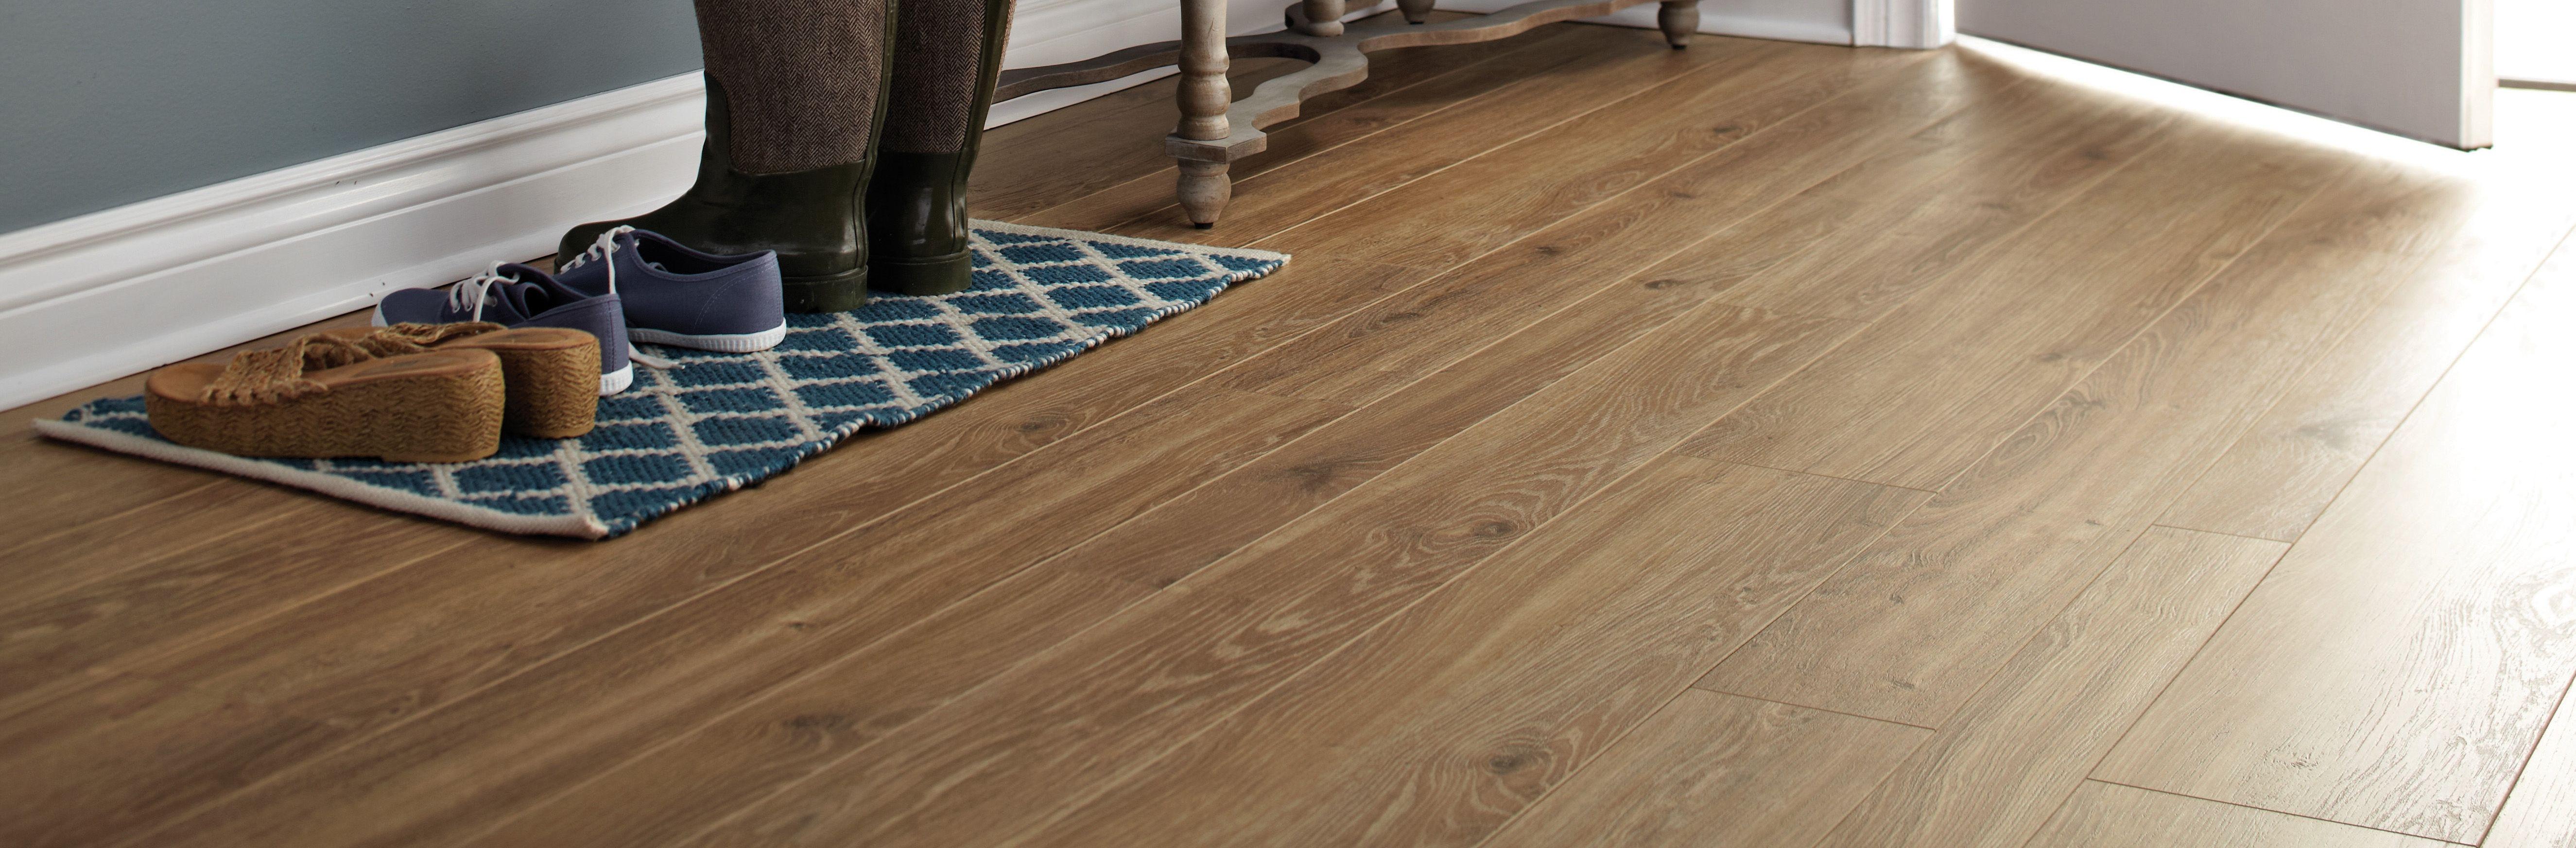 rona hardwood flooring prices of vinyl hardwood flooring vinyl plank flooring rona floor plan ideas throughout vinyl hardwood flooring vinyl plank flooring rona